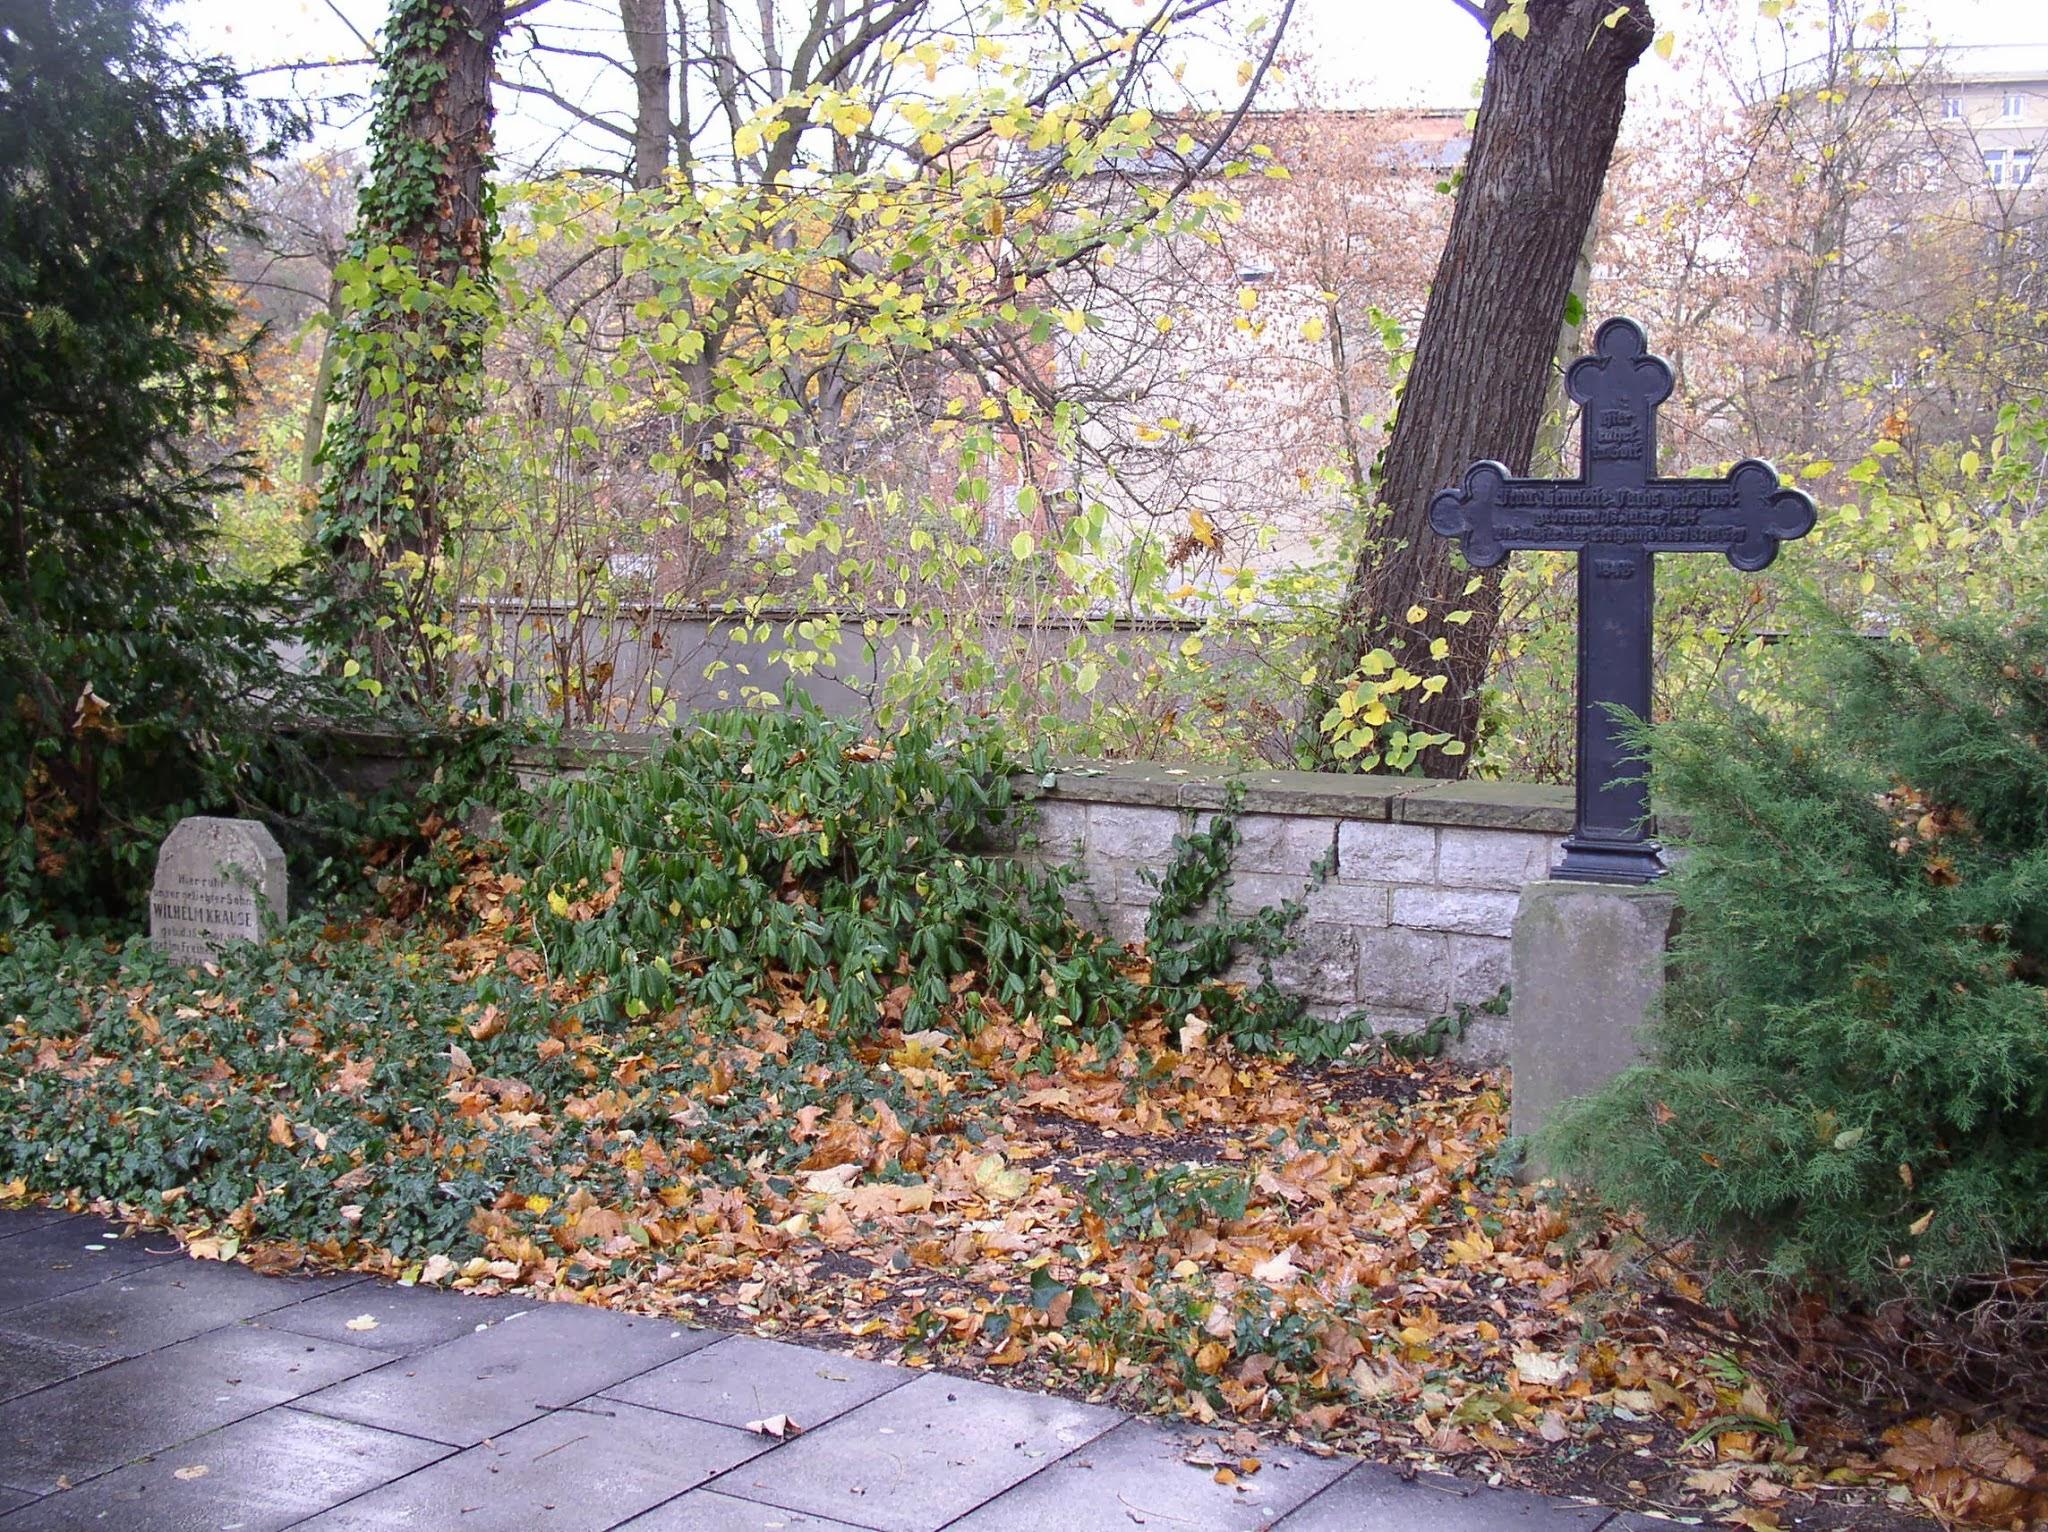 Friedhof der Märzgefallenen (Berlin, Germany)